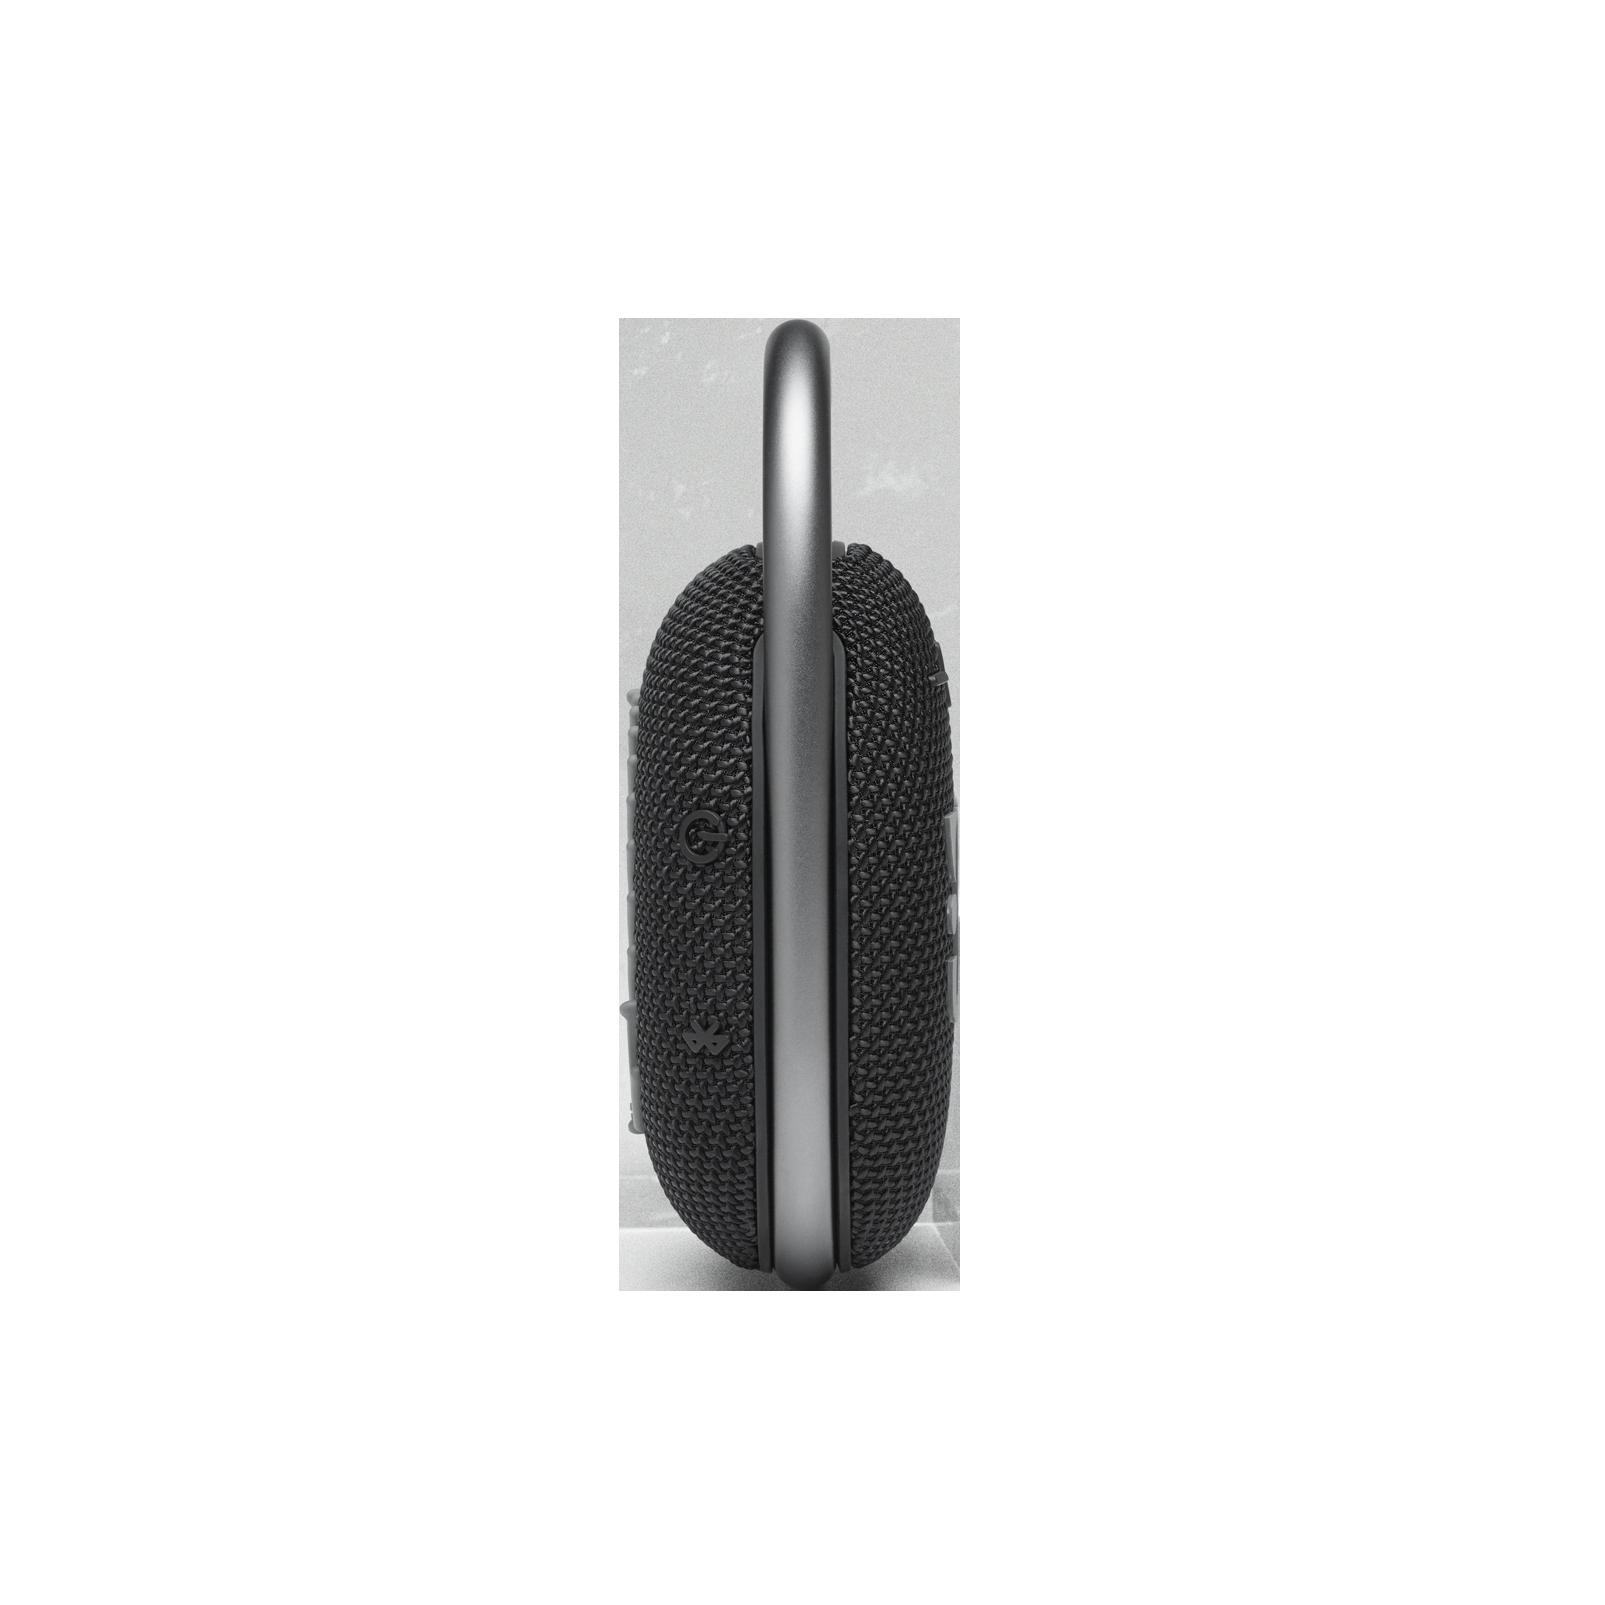 JBL CLIP 4 - Black - Ultra-portable Waterproof Speaker - Left